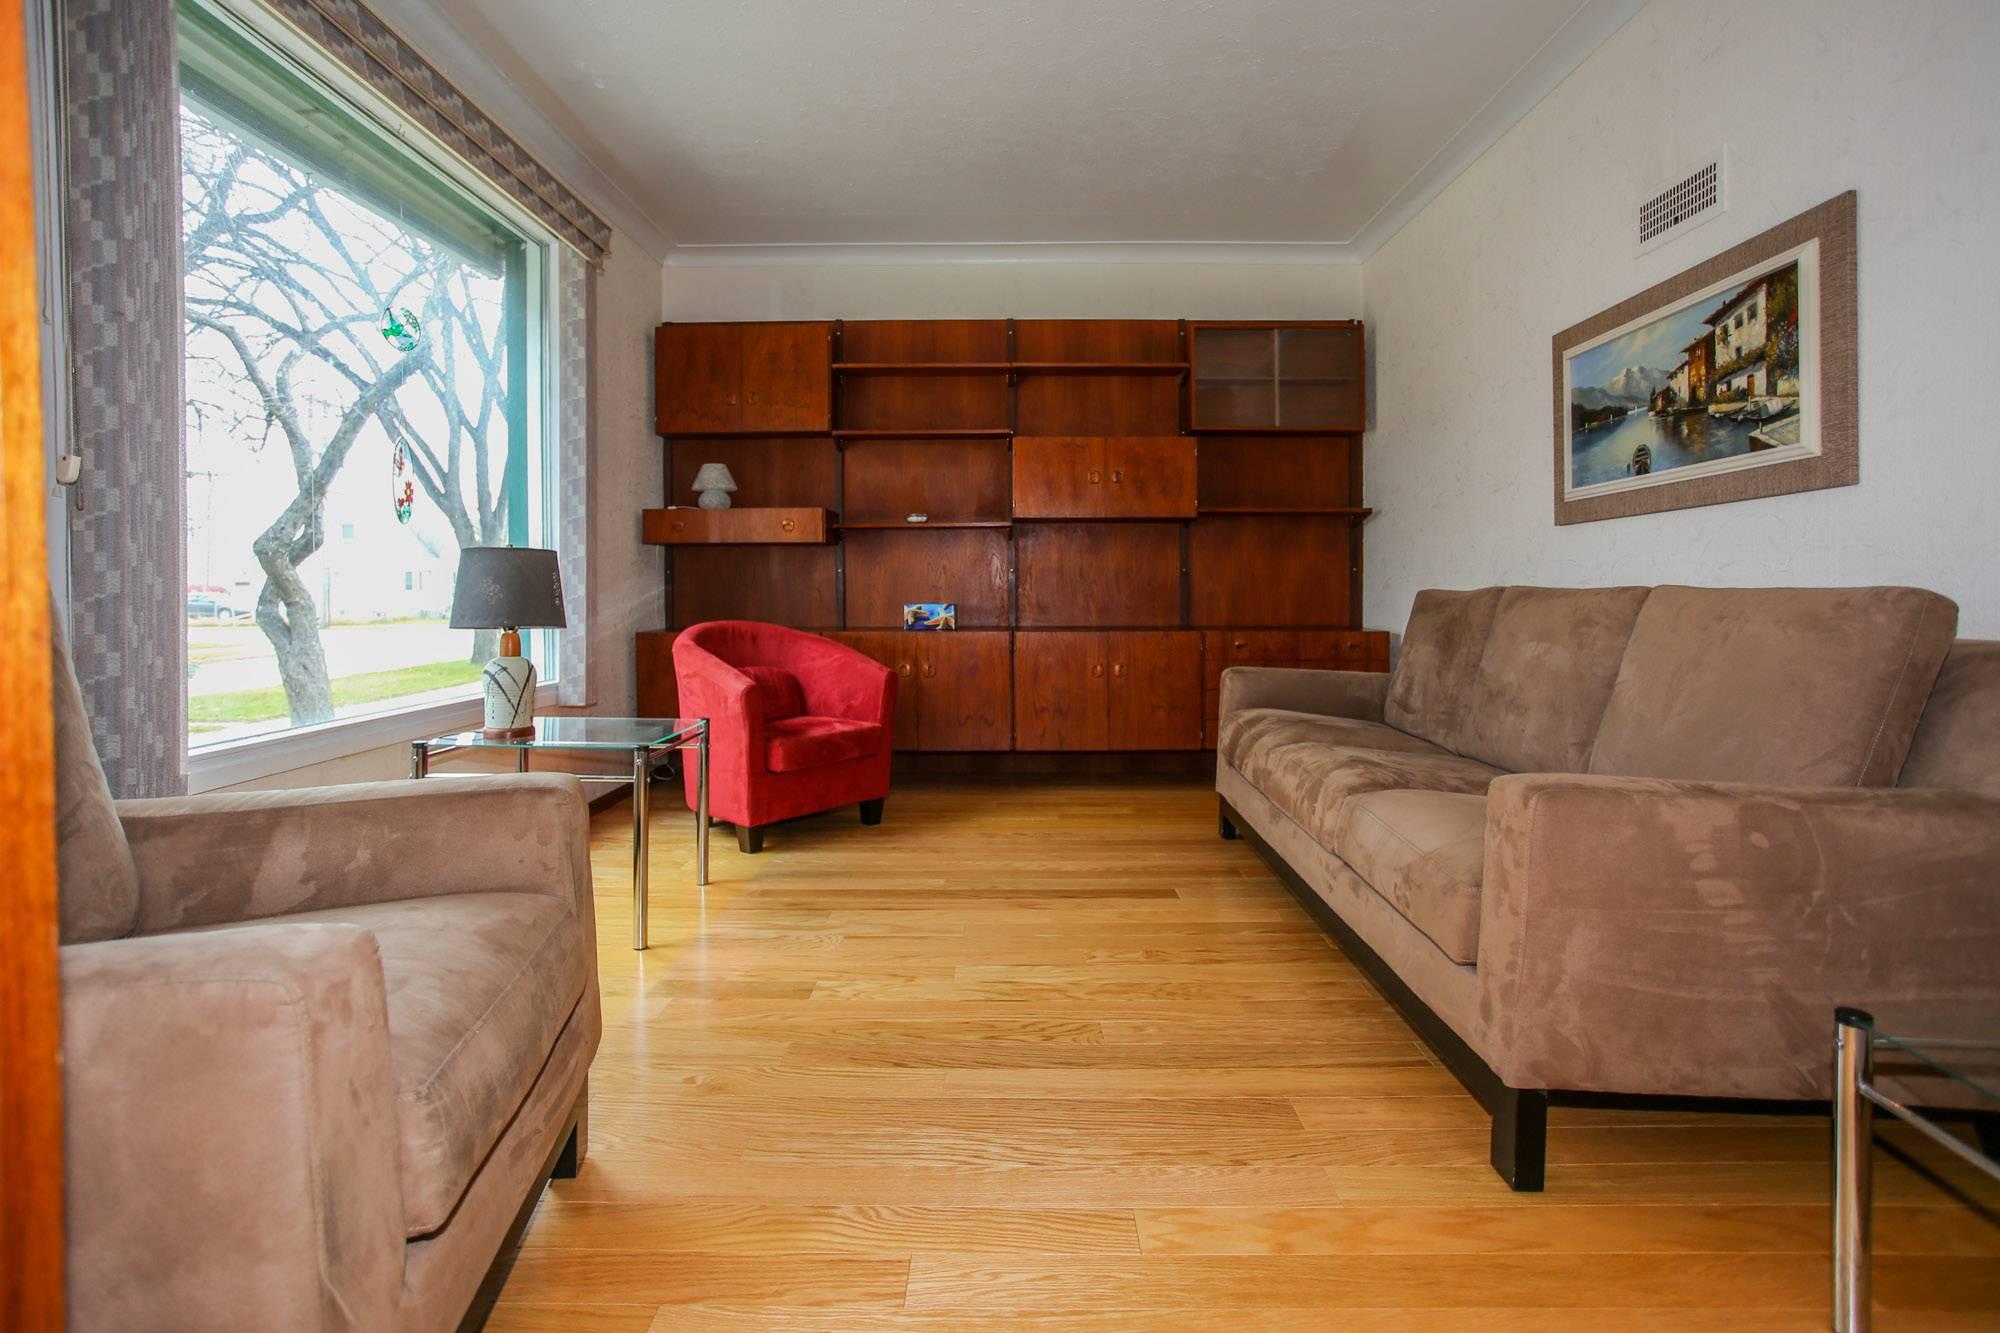 834 Clifton Street, Winnipeg, Manitoba  R3G 2Y1 - Photo 1 - 1829695